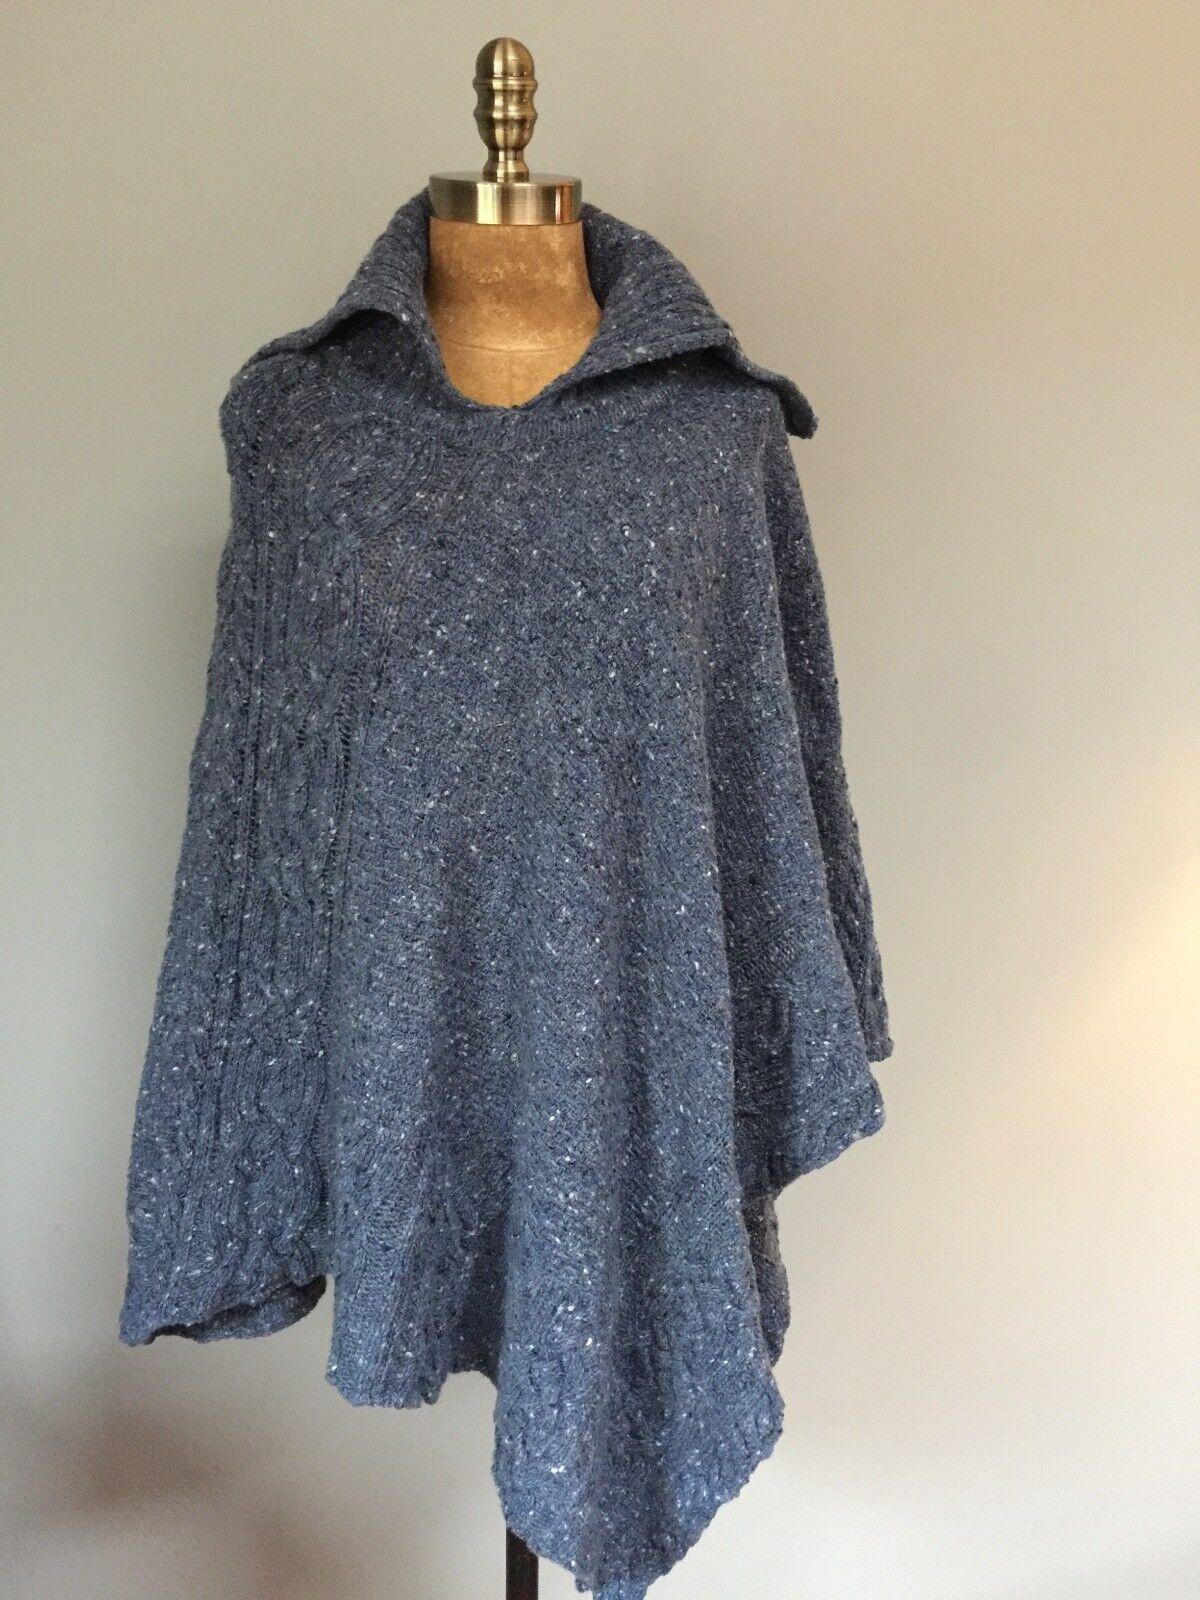 NWT 'IRELANDSEYE' blueE TWEED PONCHO 'AILISH' XL